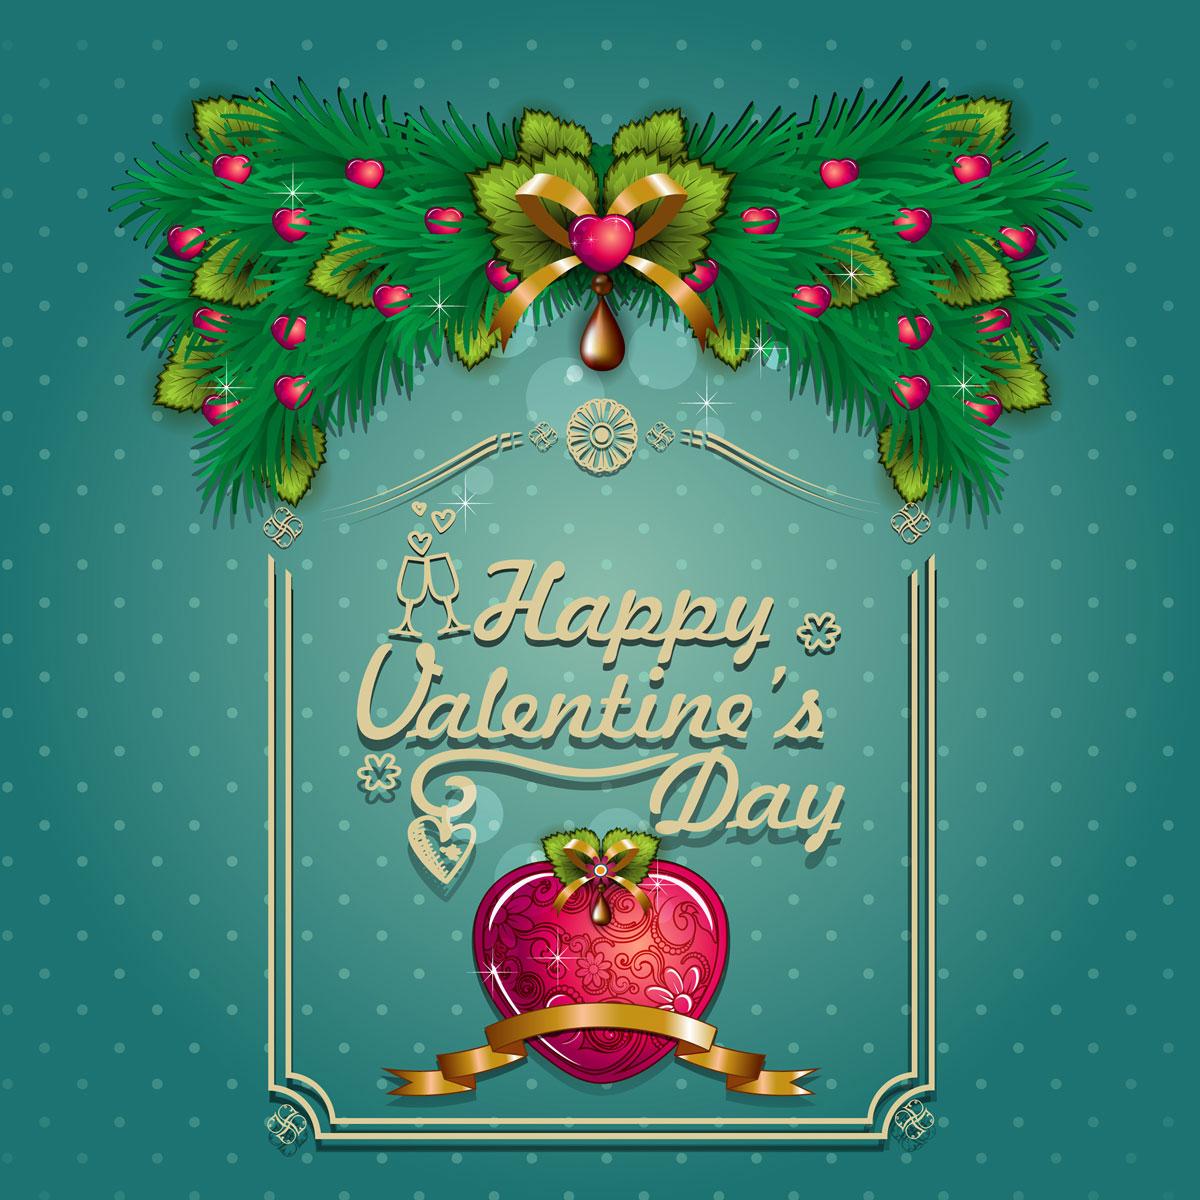 13款情人节七夕节爱心心形宣传海报设计AI矢量素材 Valentines Day Heart-shaped Vector Poster插图